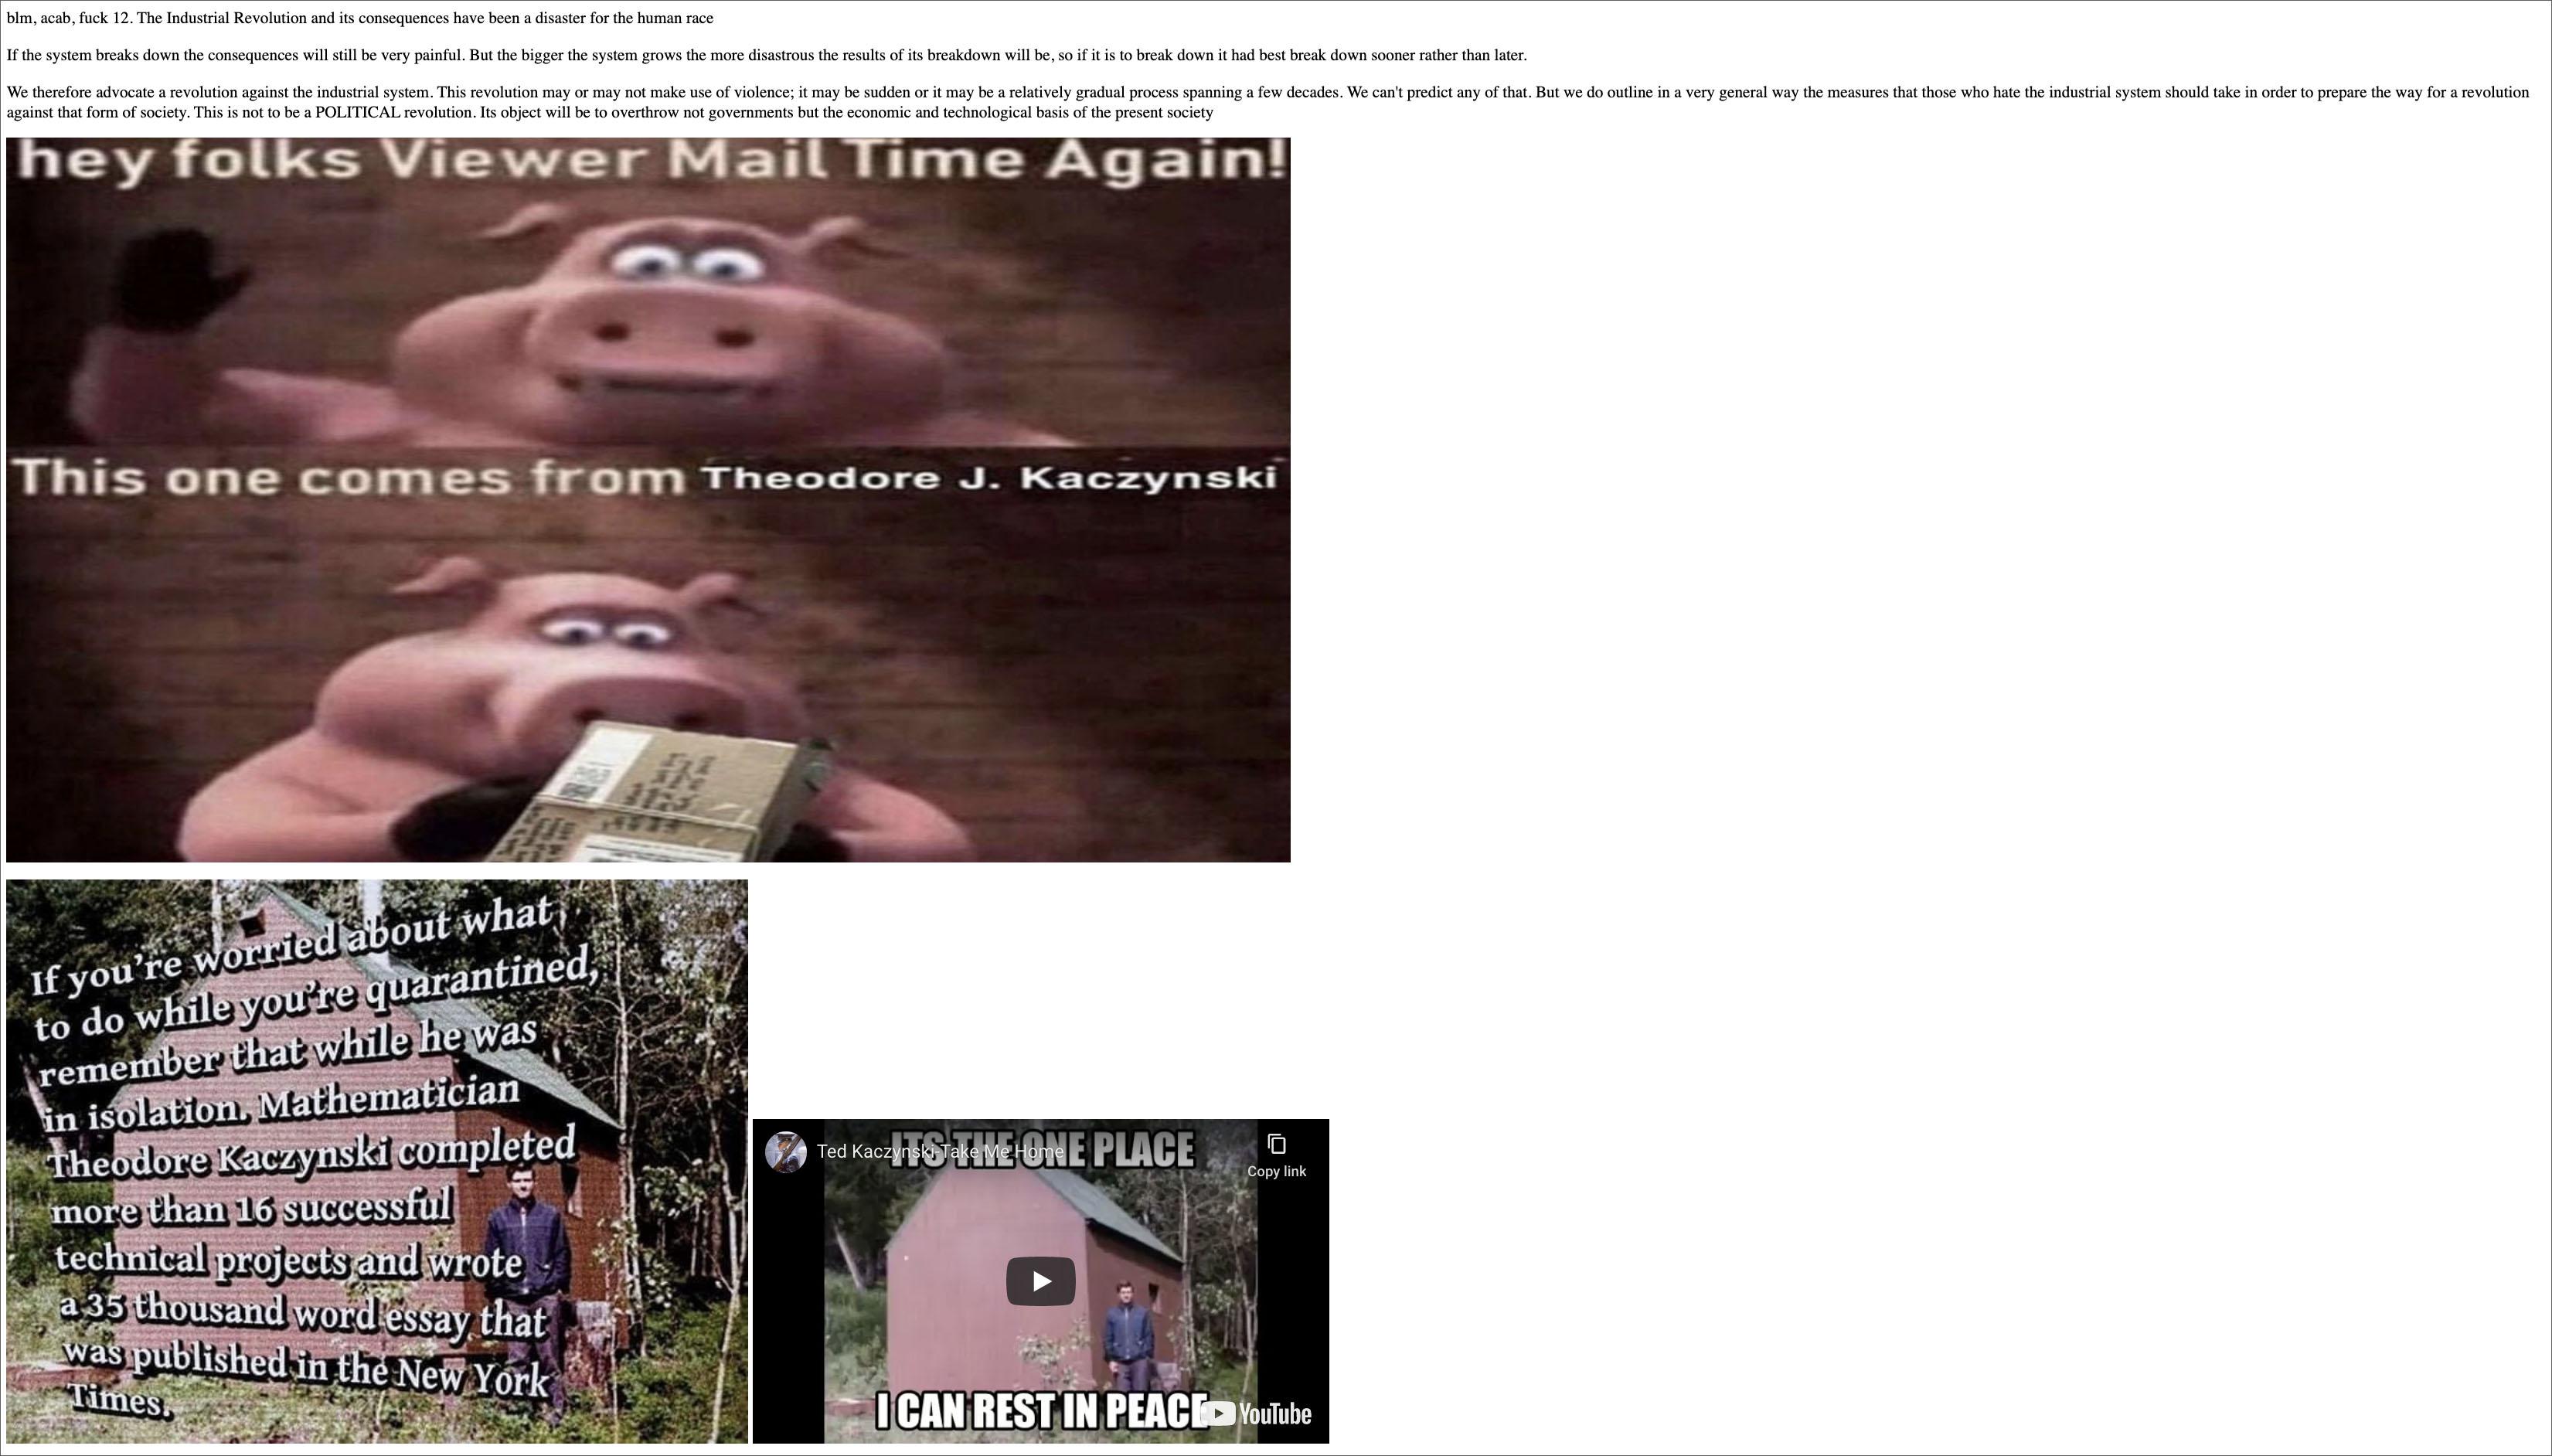 Infowars Site Taken Over By Antifa Anti-Free Speech Activists